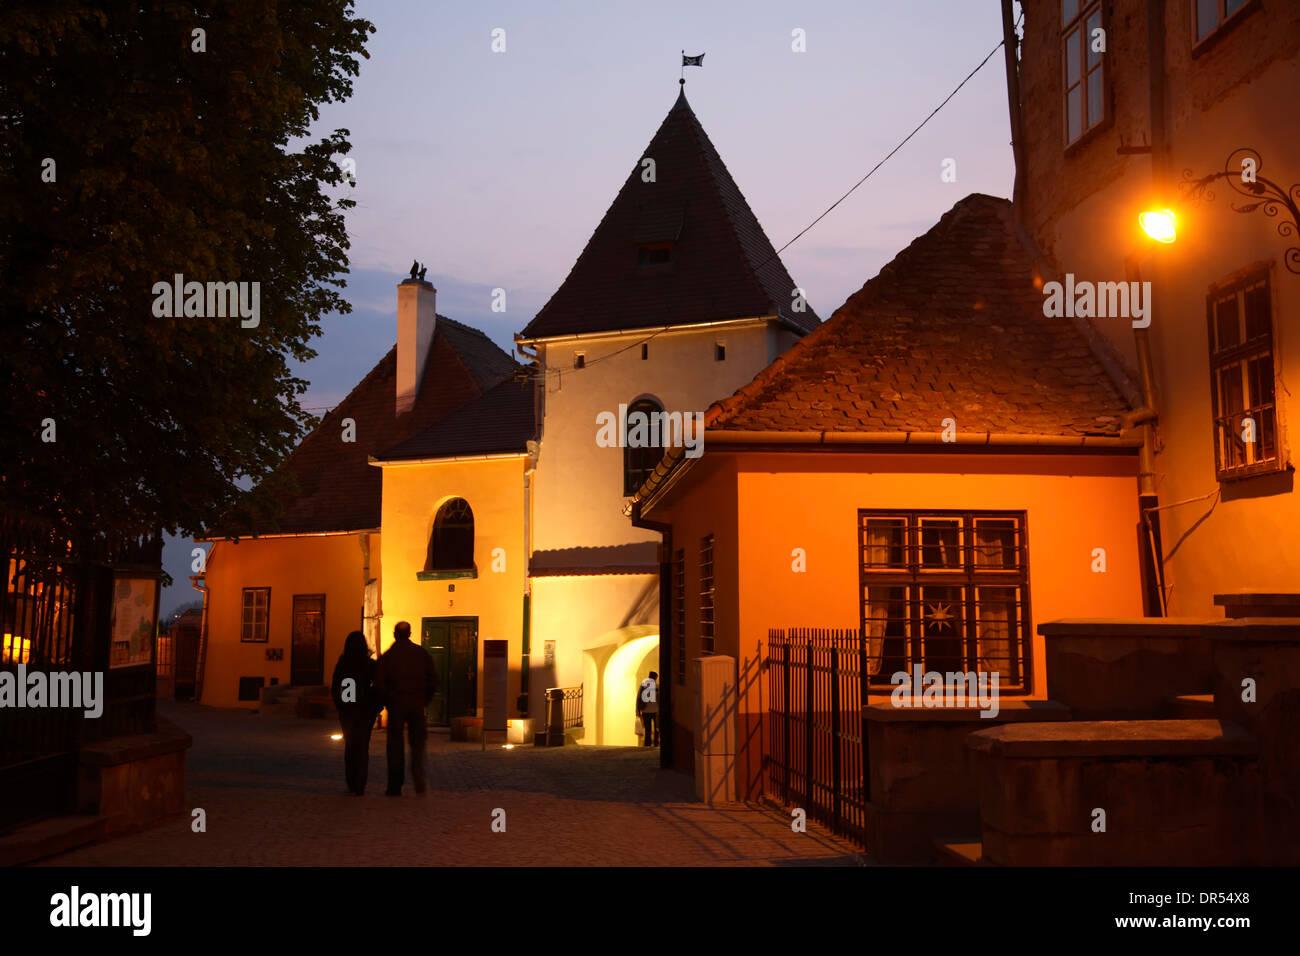 Houses at Huetplatz, Sibiu (Hermannstadt),  Transylvania, Romania, Europe - Stock Image